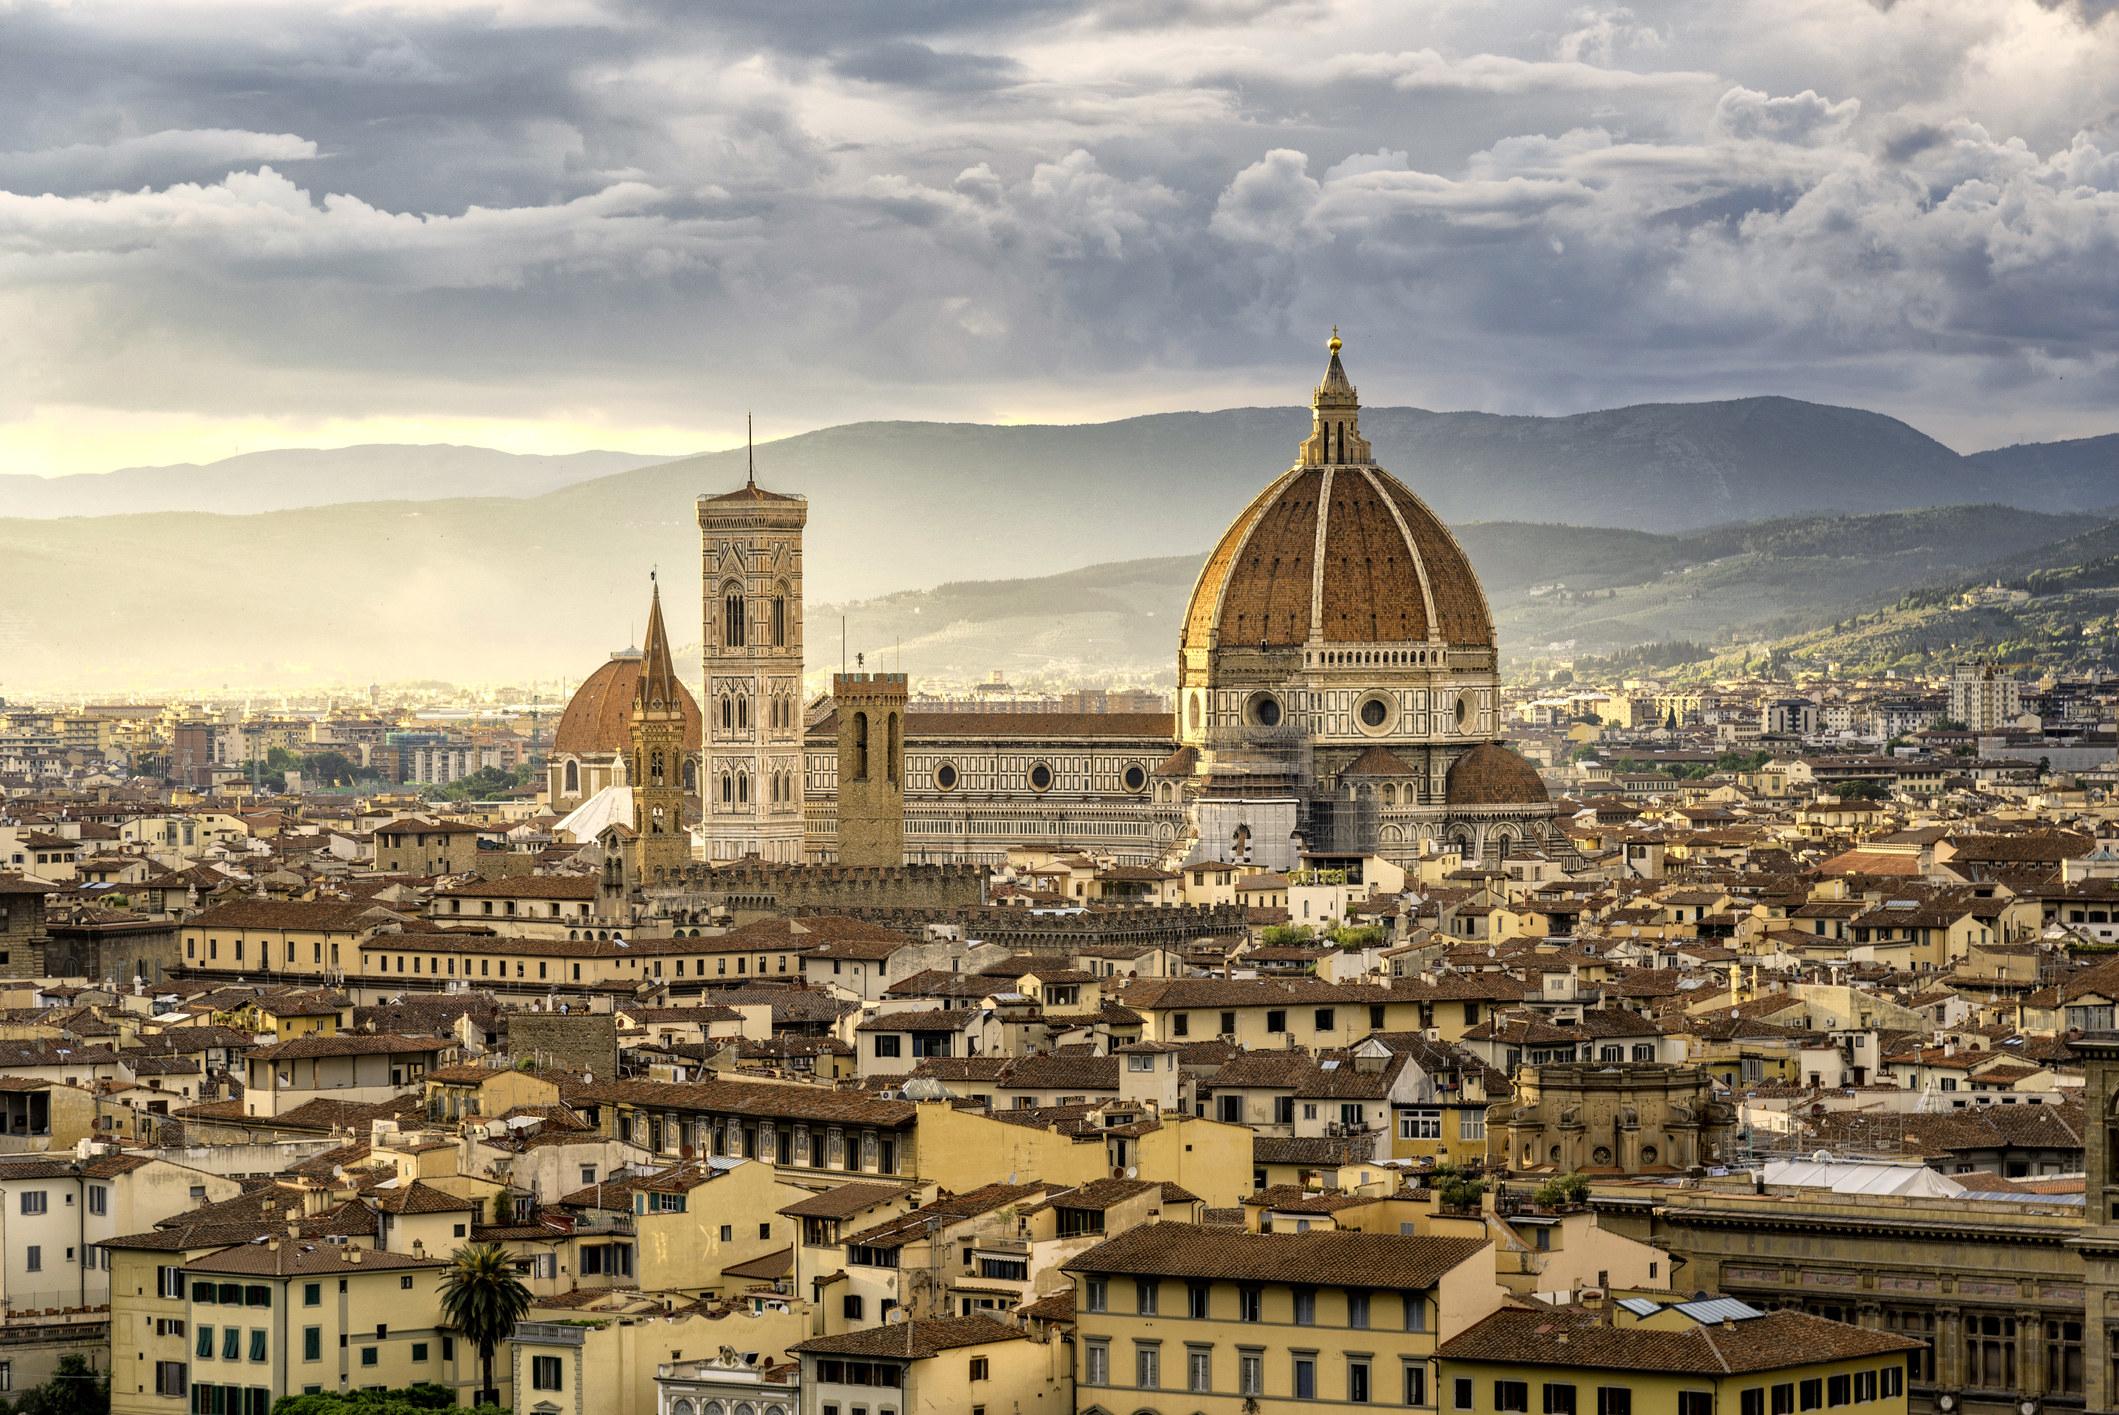 A cityscape view of the Santa Maria Nouvelle Duomo